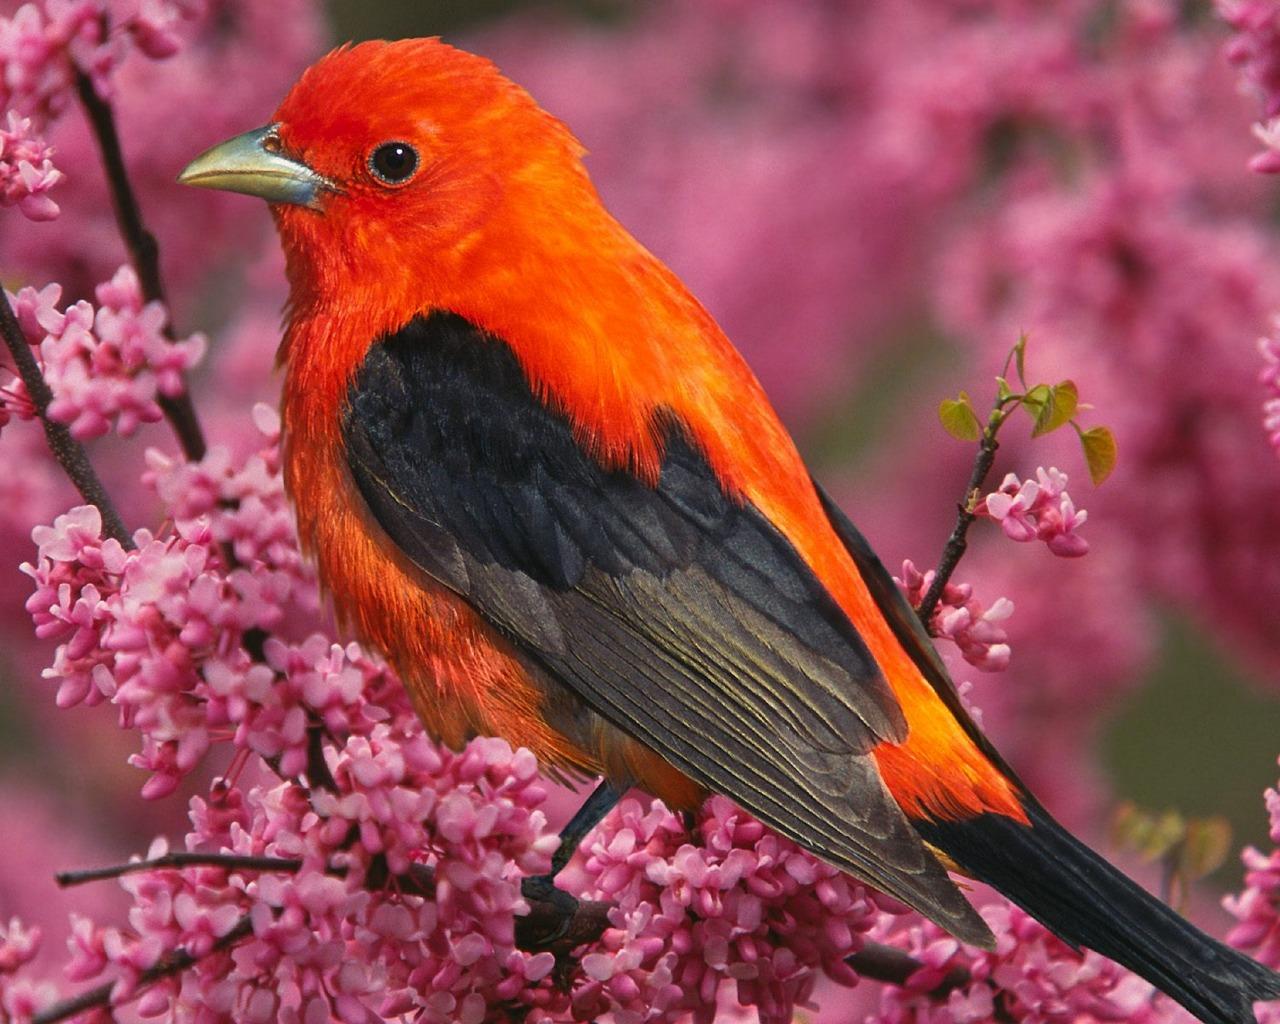 Birds-HD-Wallpapers-1280-X-1024-2.jpg